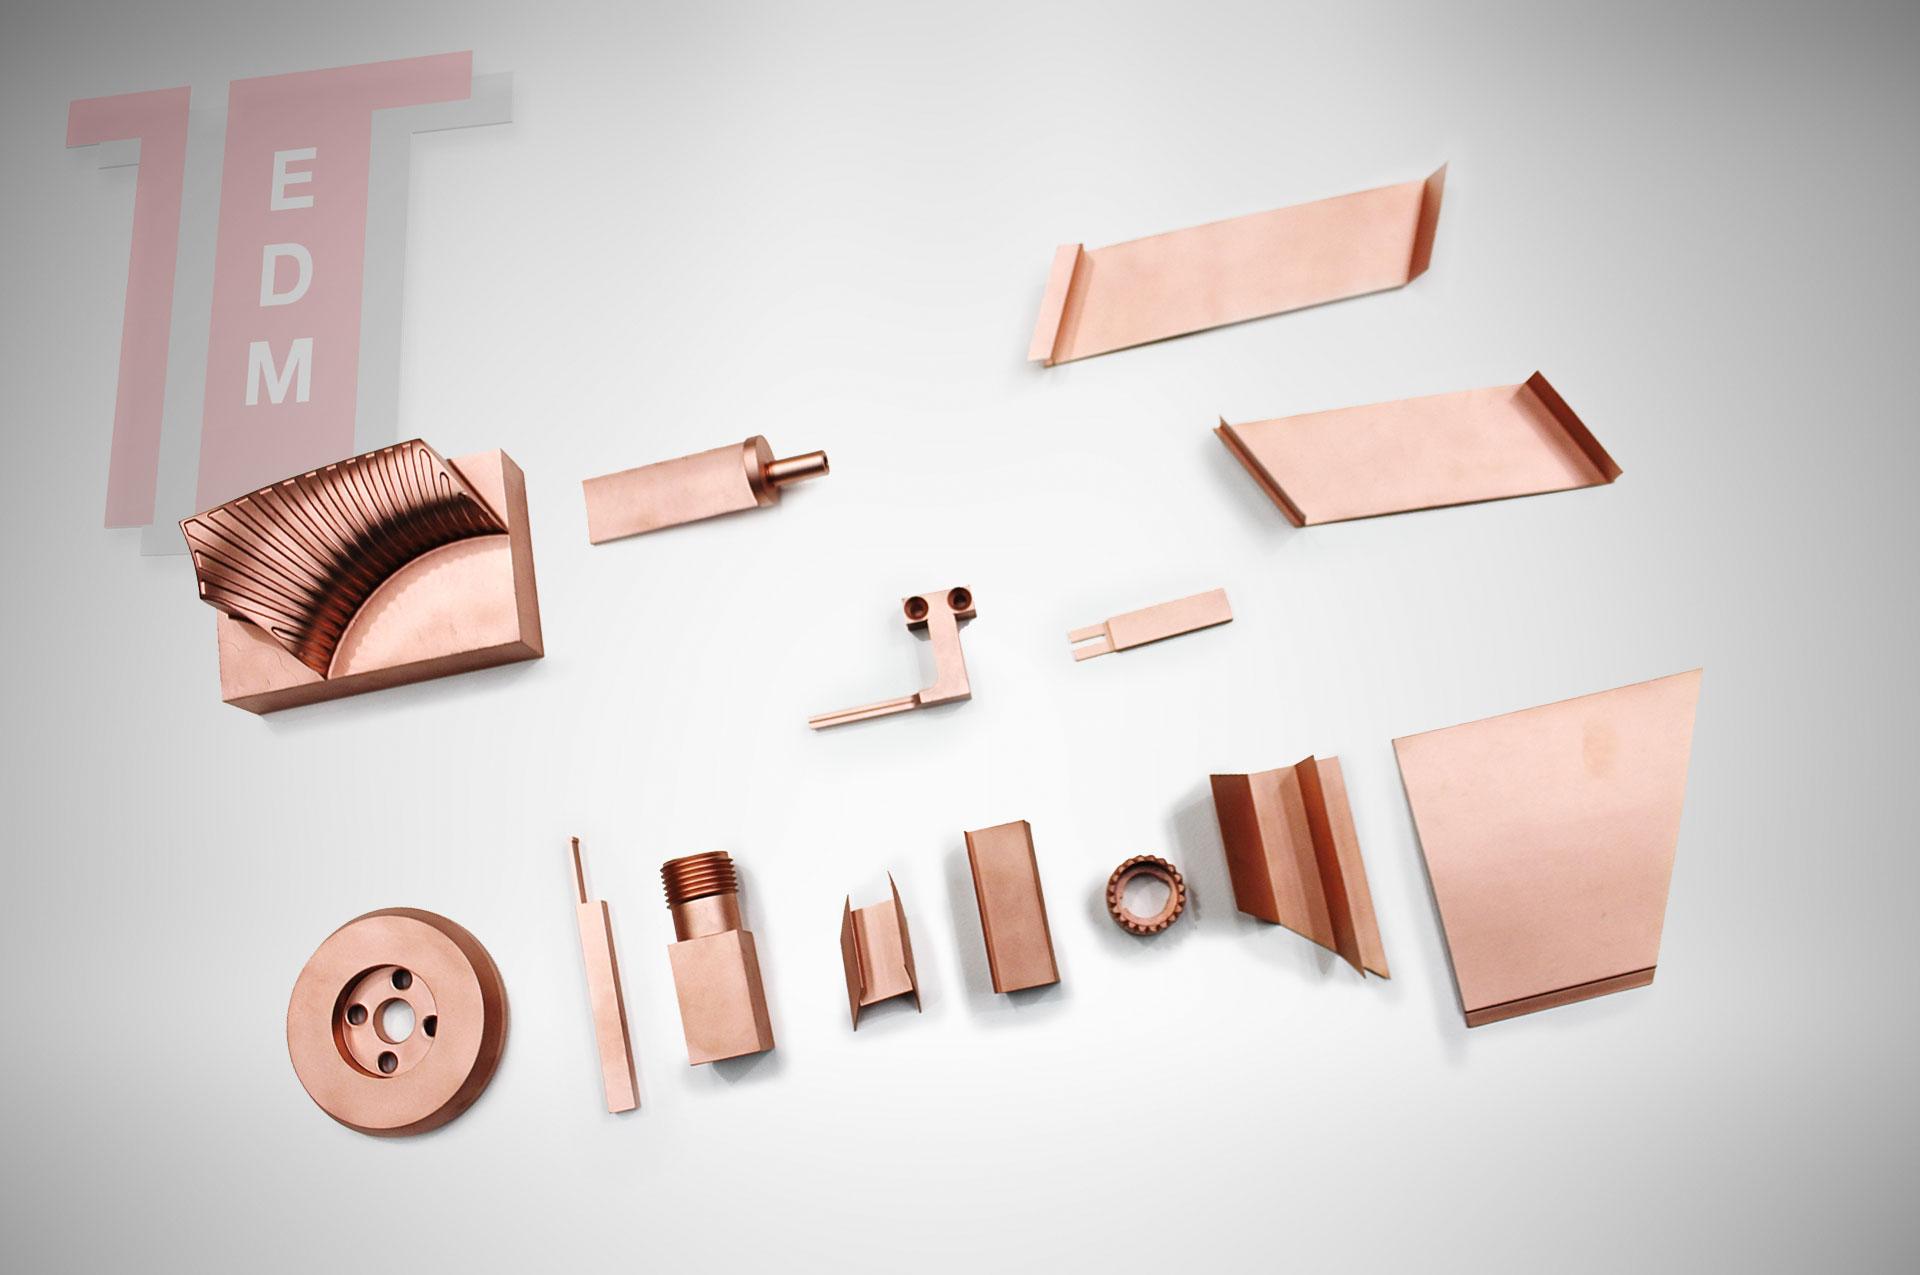 elettrodi rame produzione gamma copper electrodes elettrodi in rame